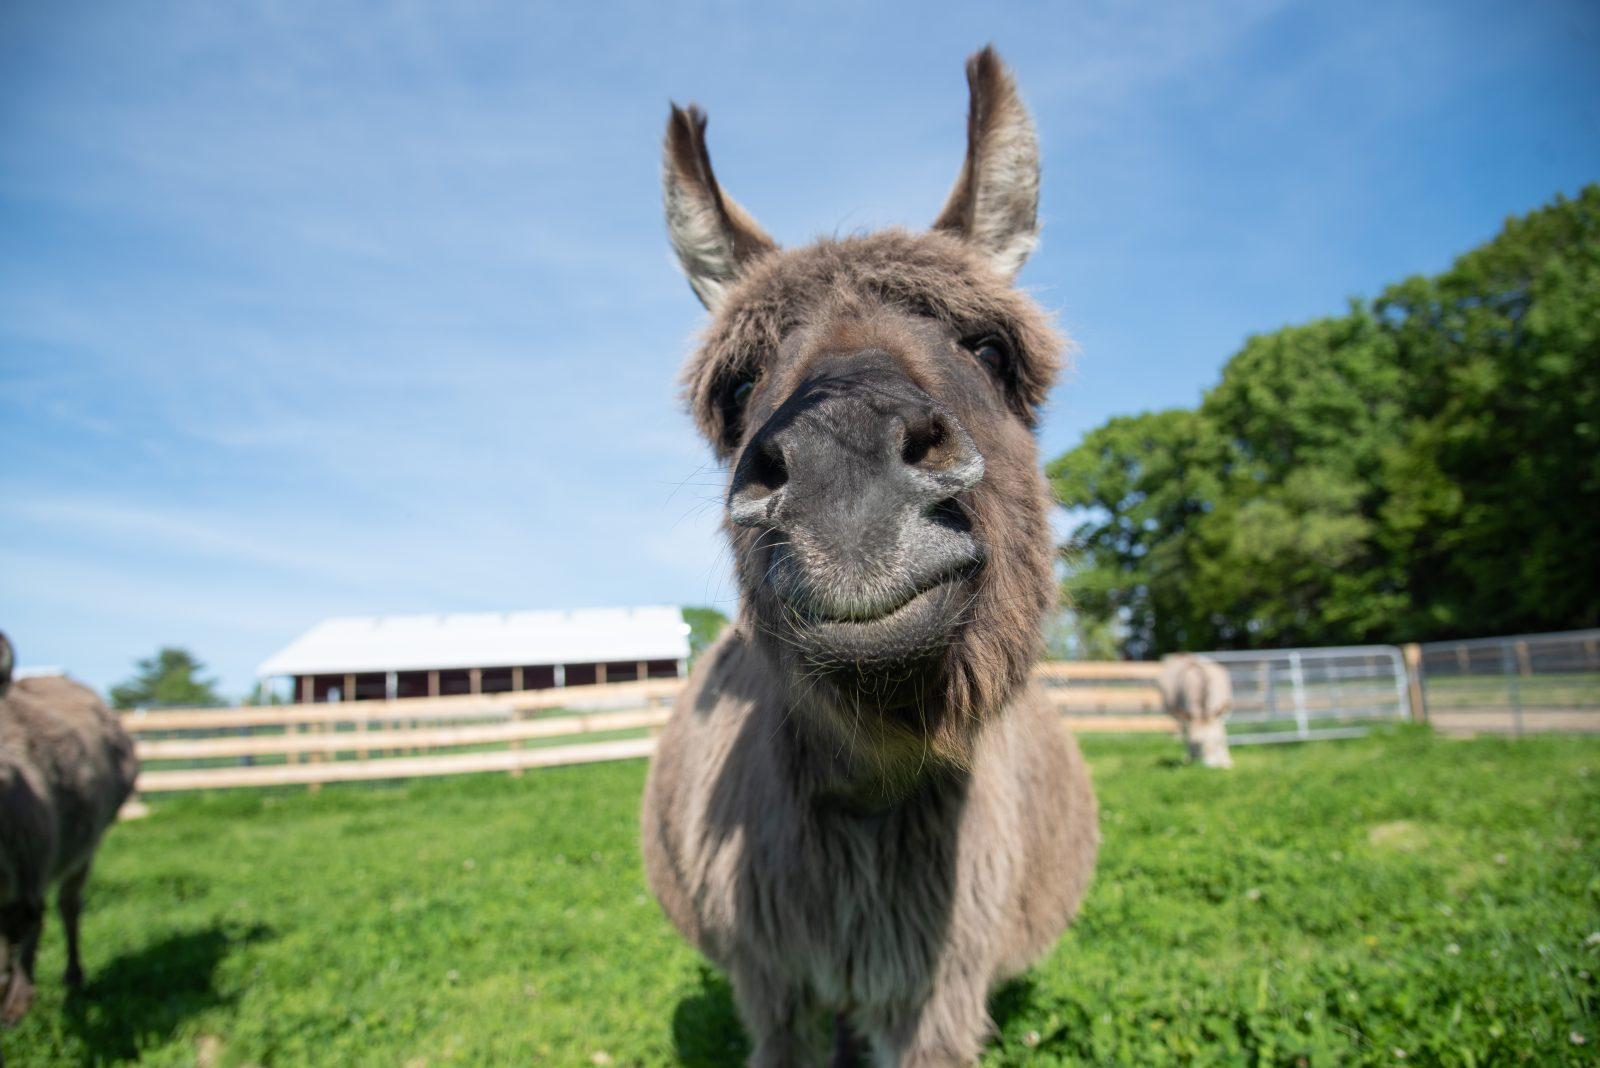 MJ Donkey at Farm Sanctuary's New York shelter